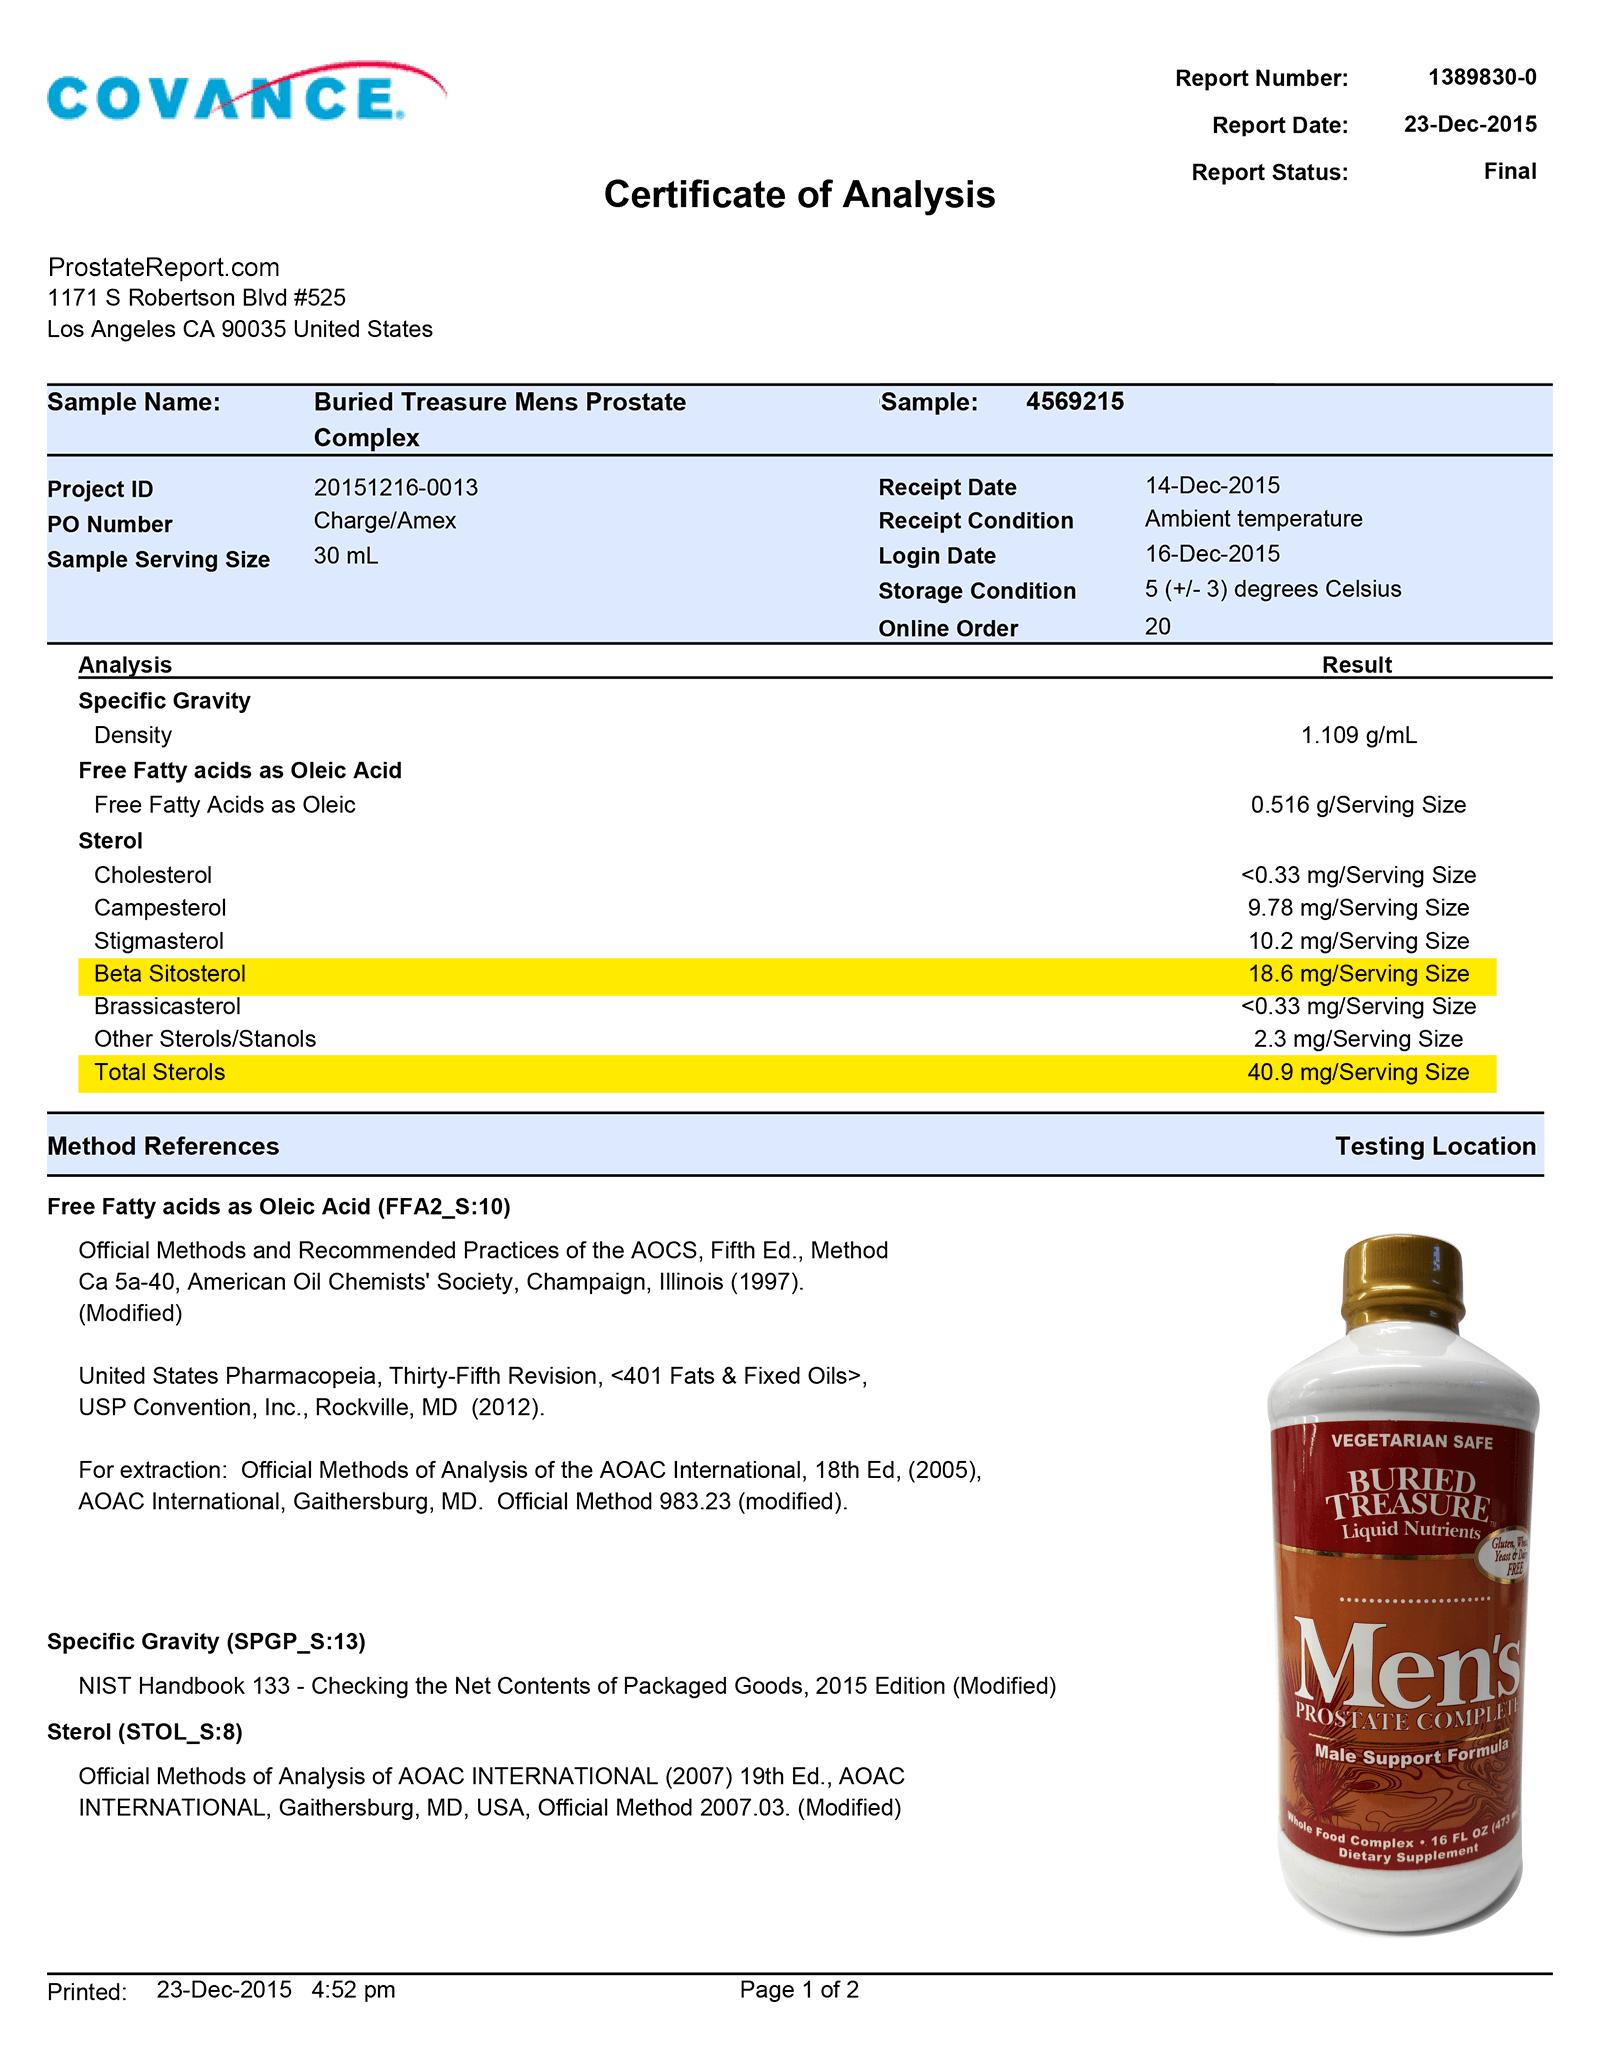 Men's Prostate Complex lab report